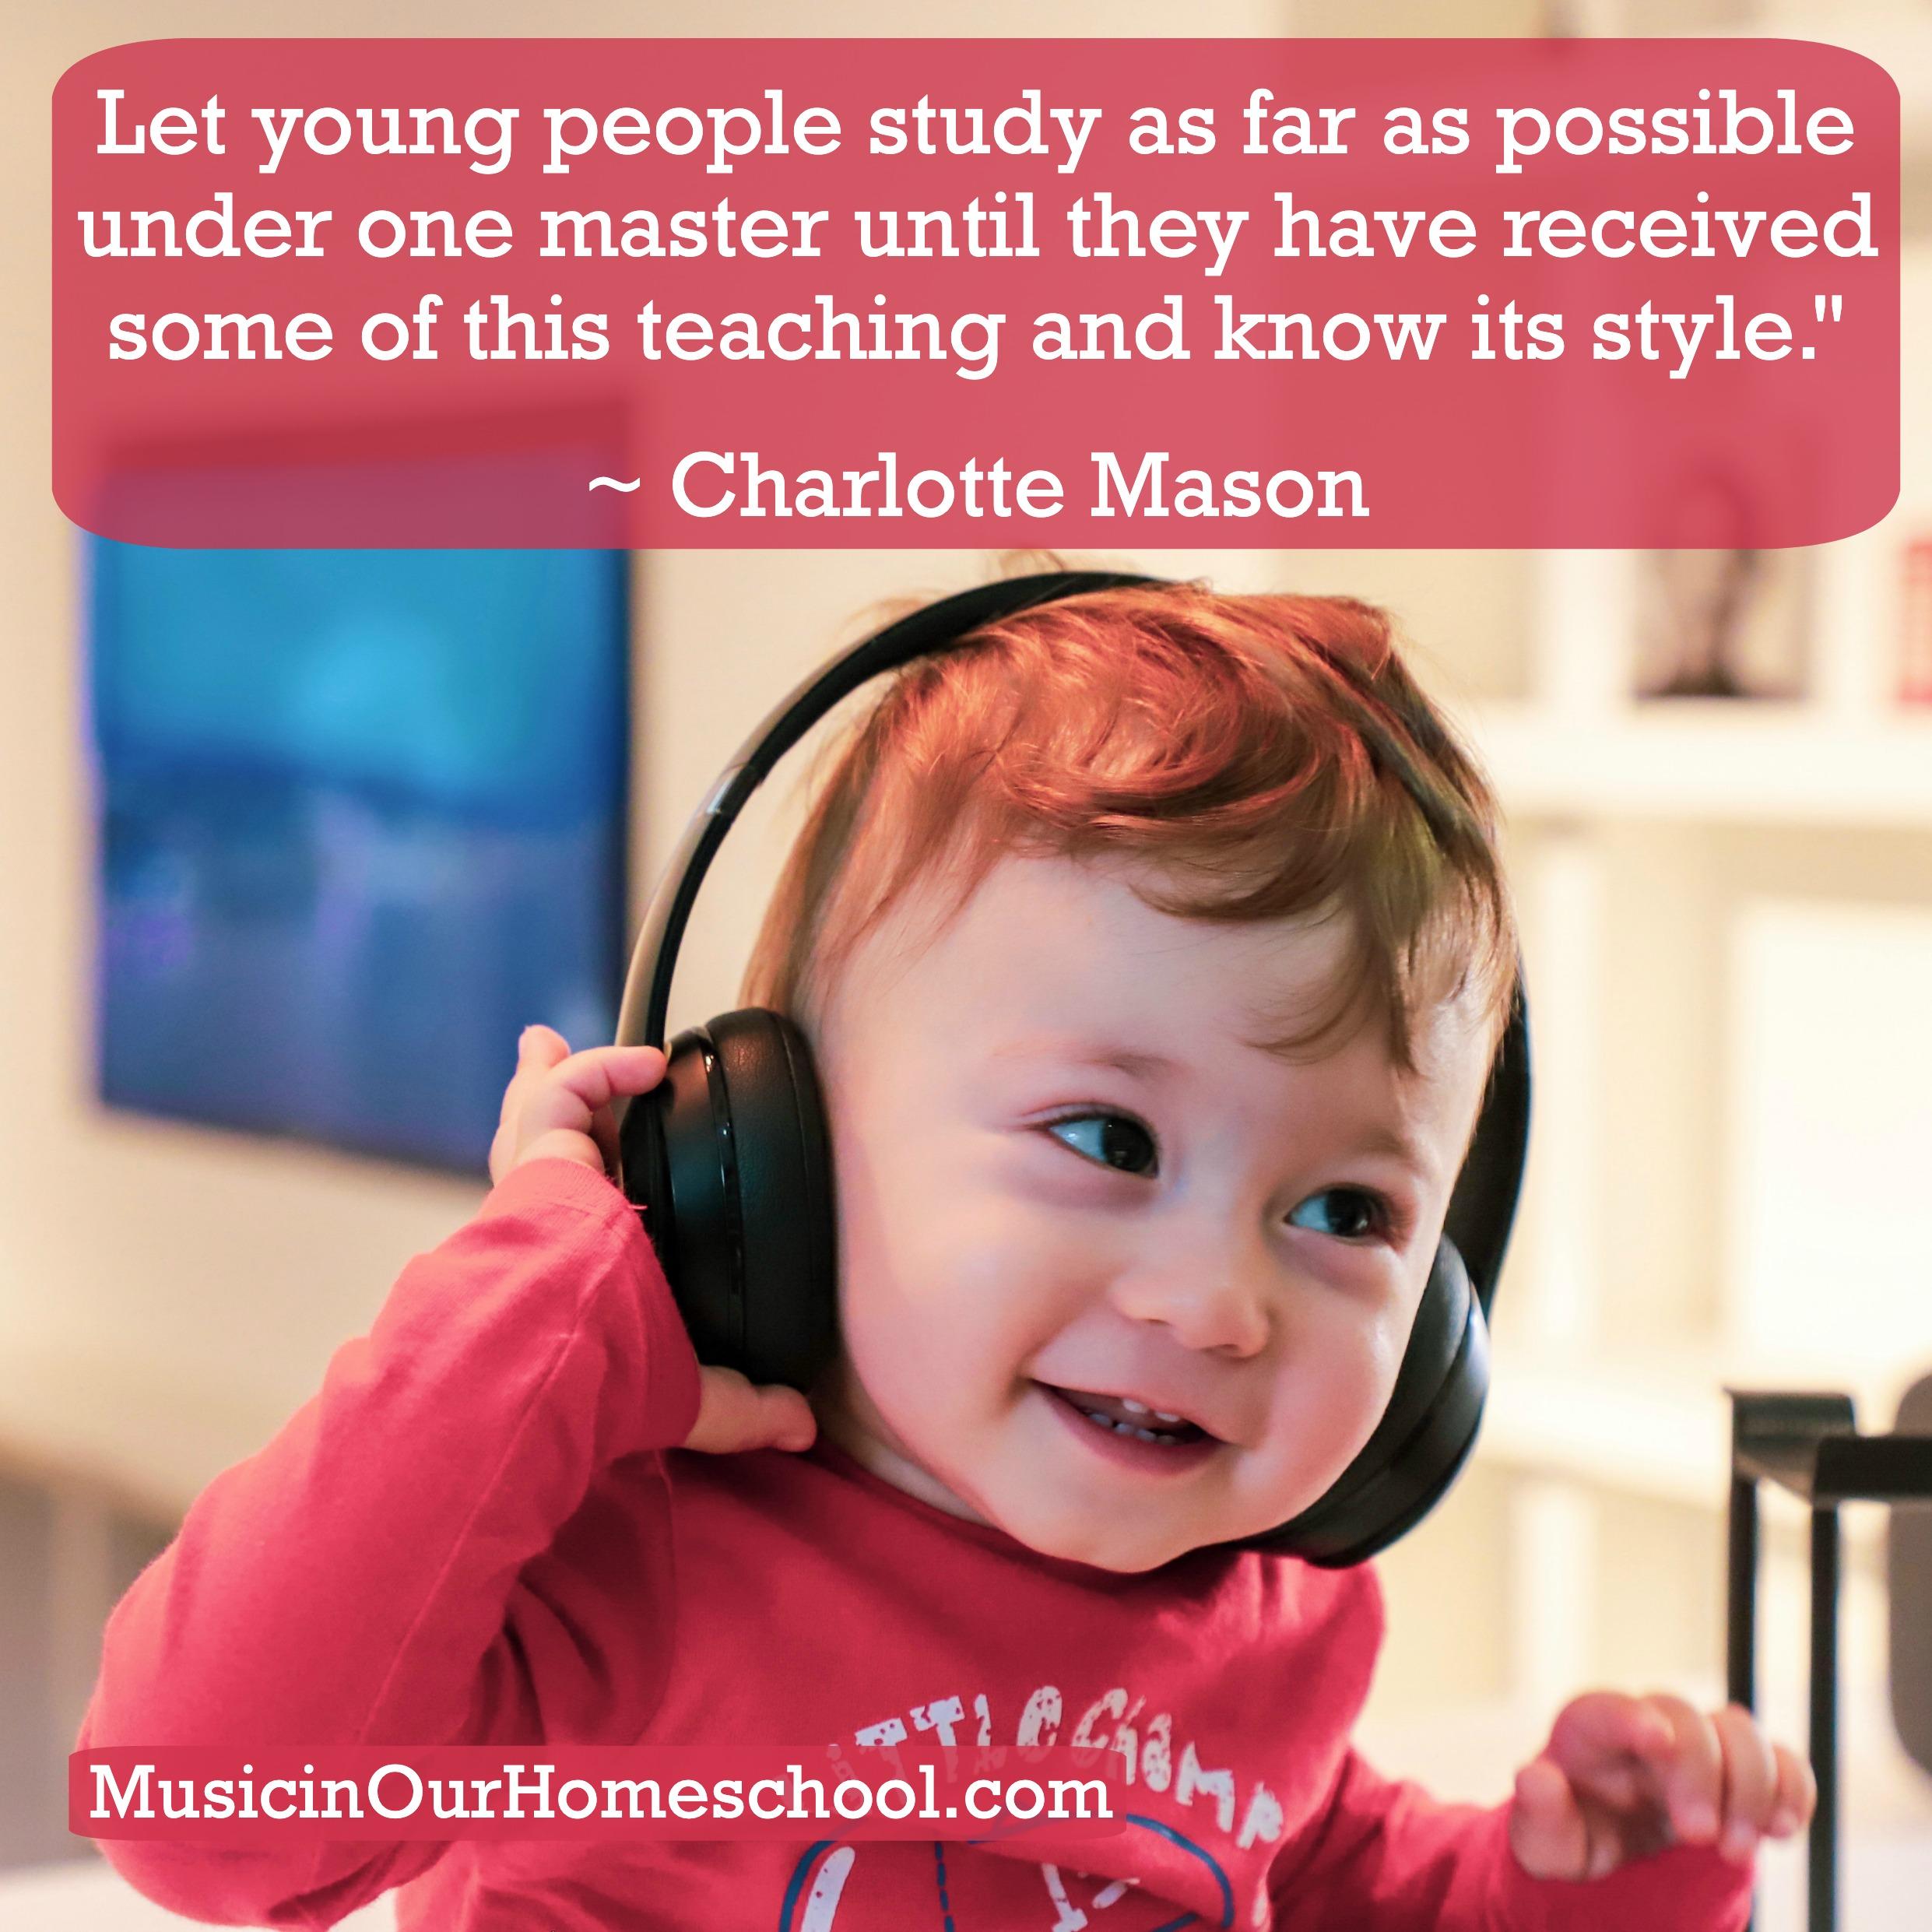 How to Teach Music the Charlotte Mason Way #charlottemason #charlottemasonhomeschool #homeschoolmusic #musicinourhomeschool